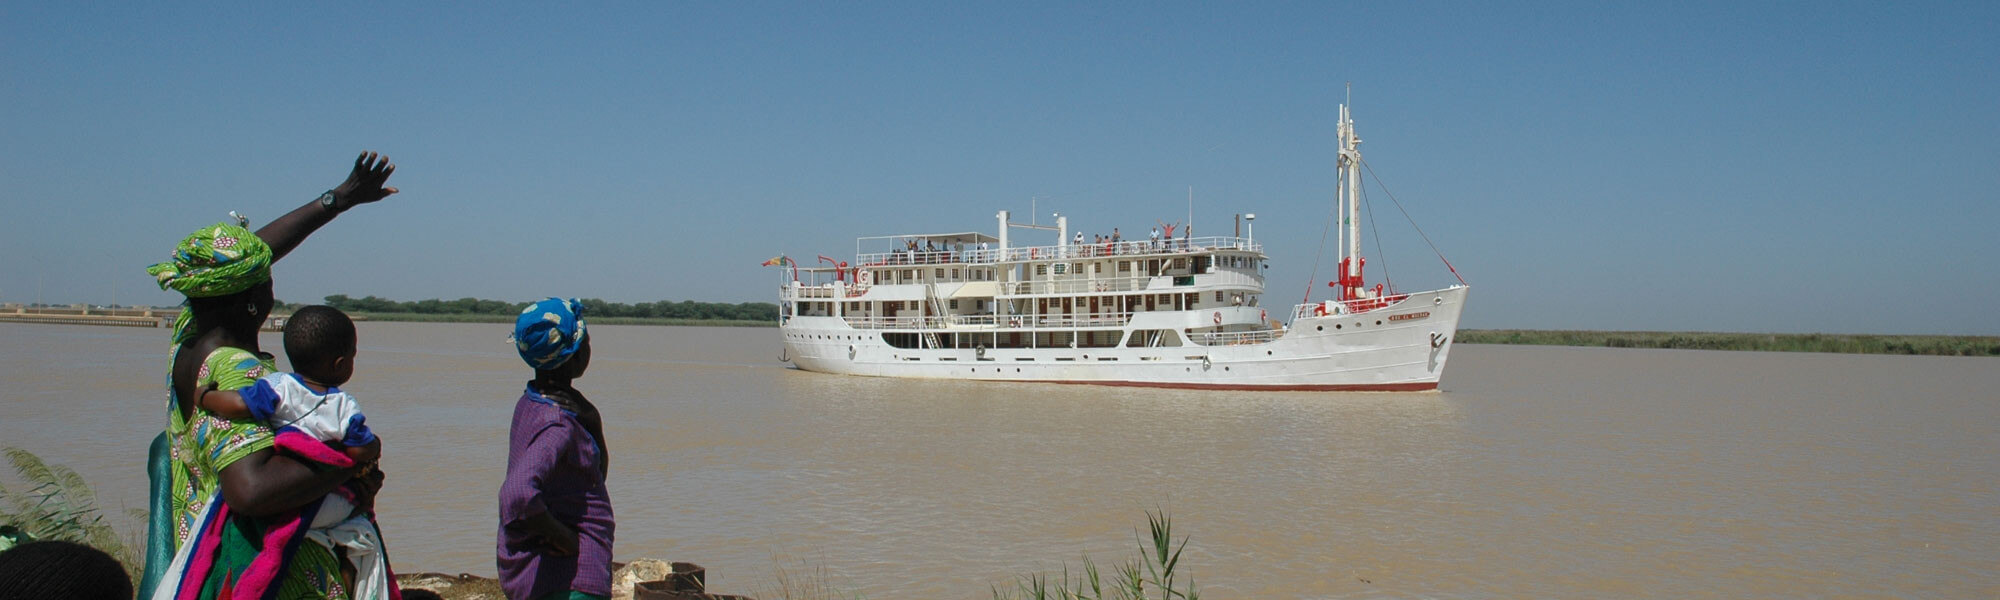 Cruise on River Senegal 8 days